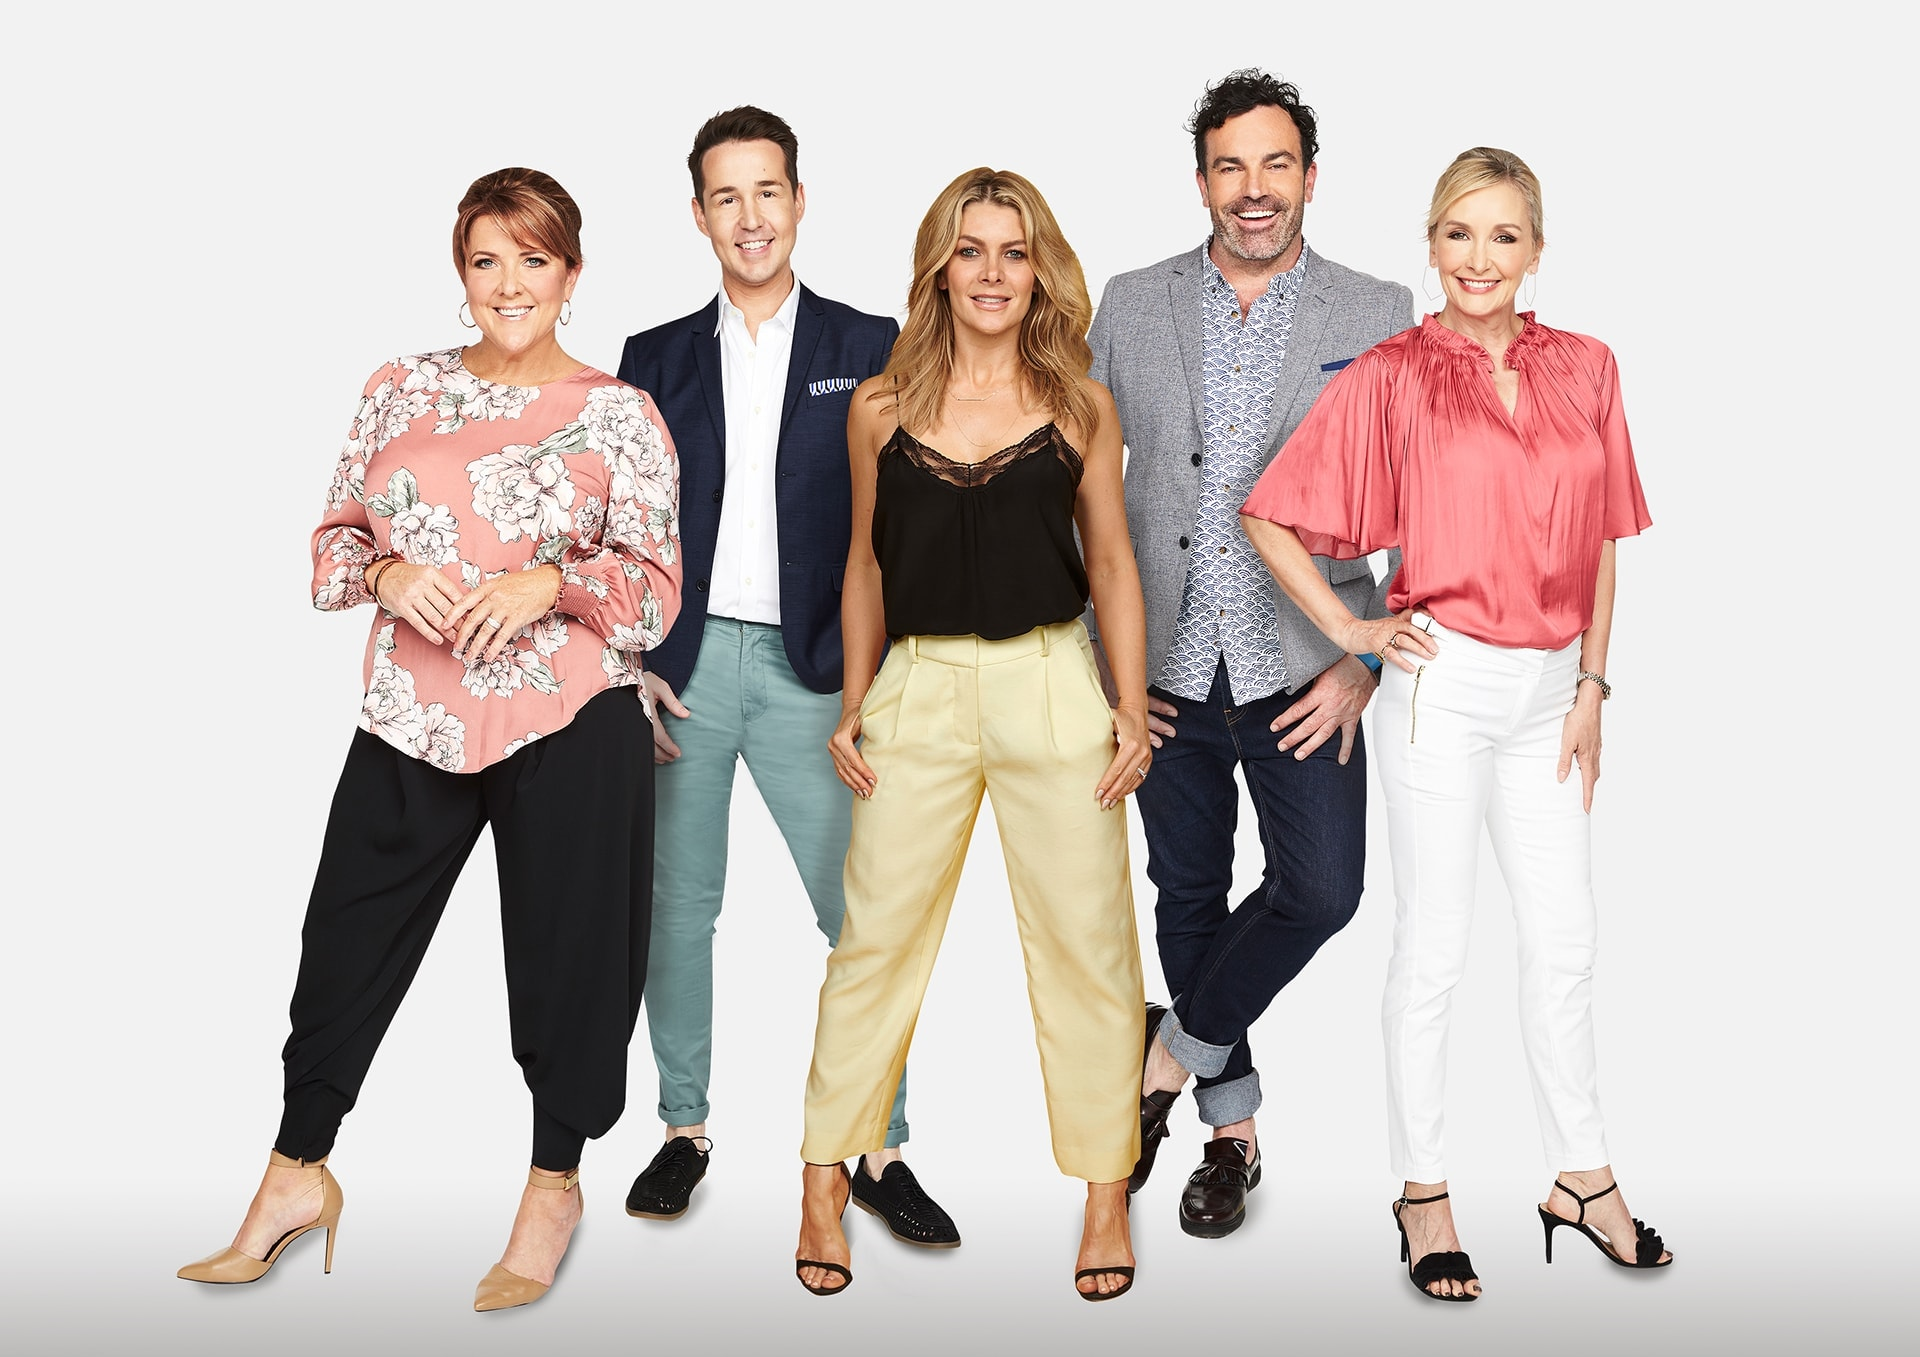 changing rooms australia designers chris carroll and natalie bassingthwaite